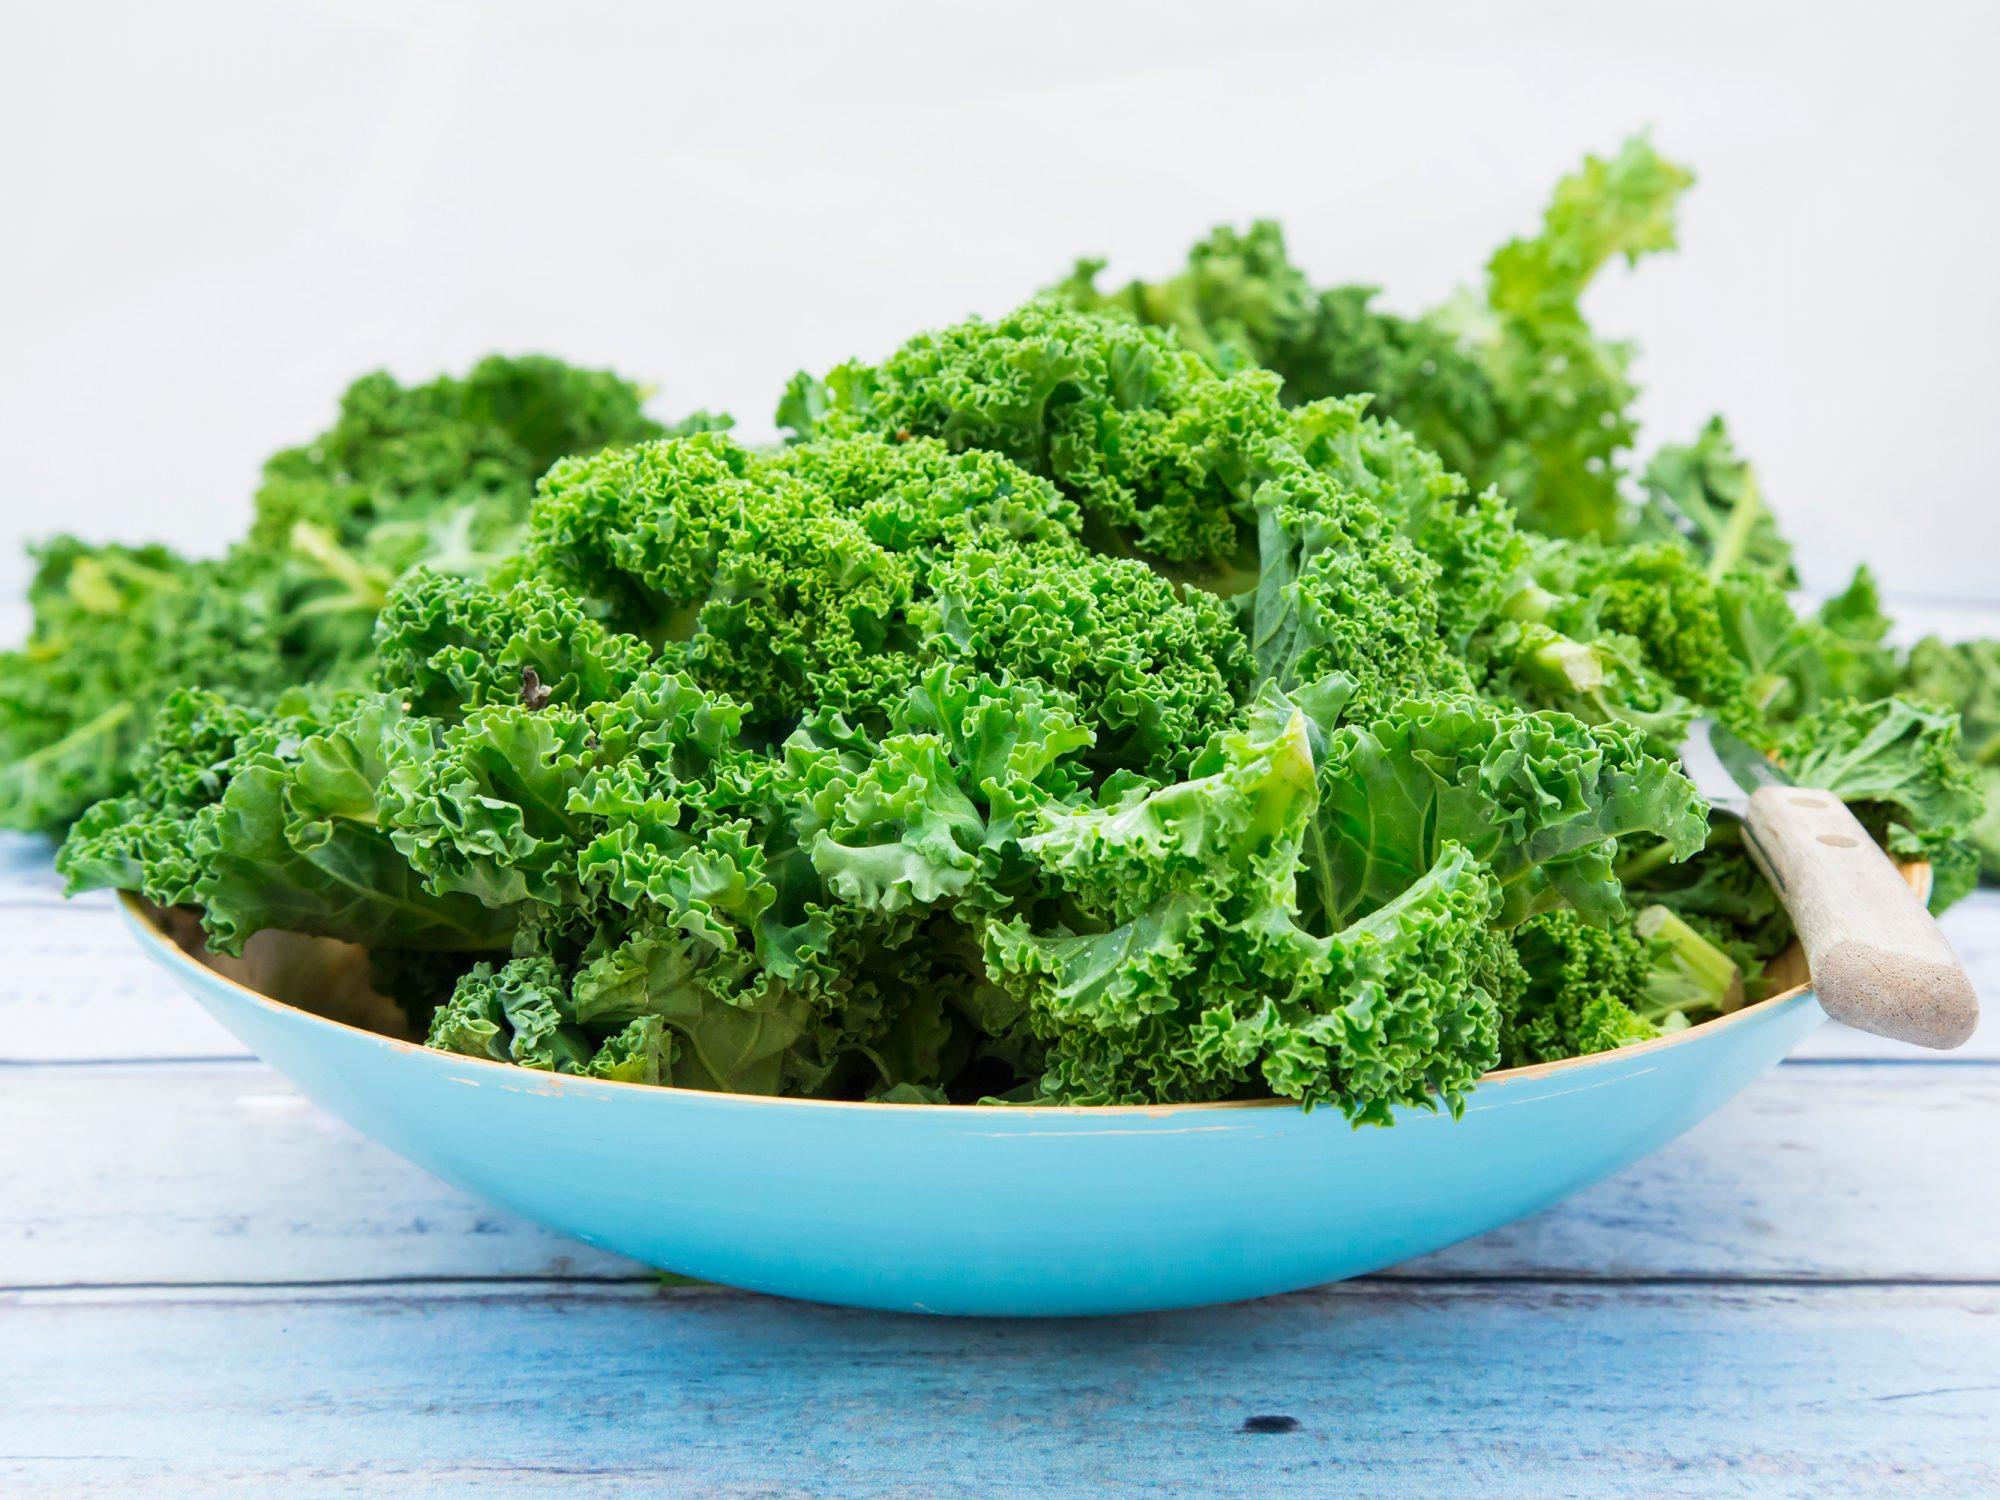 5 Secrets for Making Raw Veggies Actually Taste Good